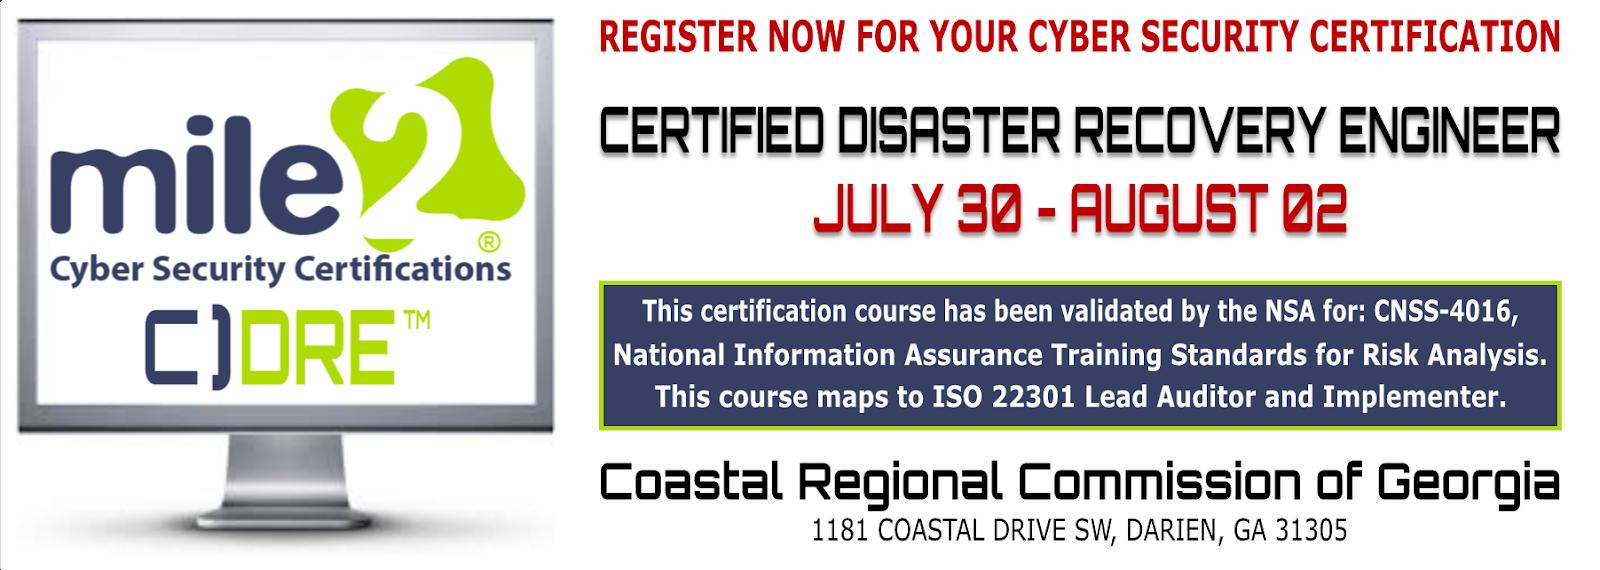 Michael I Kaplan Earn Your Cdre Cyber Security Certification In July